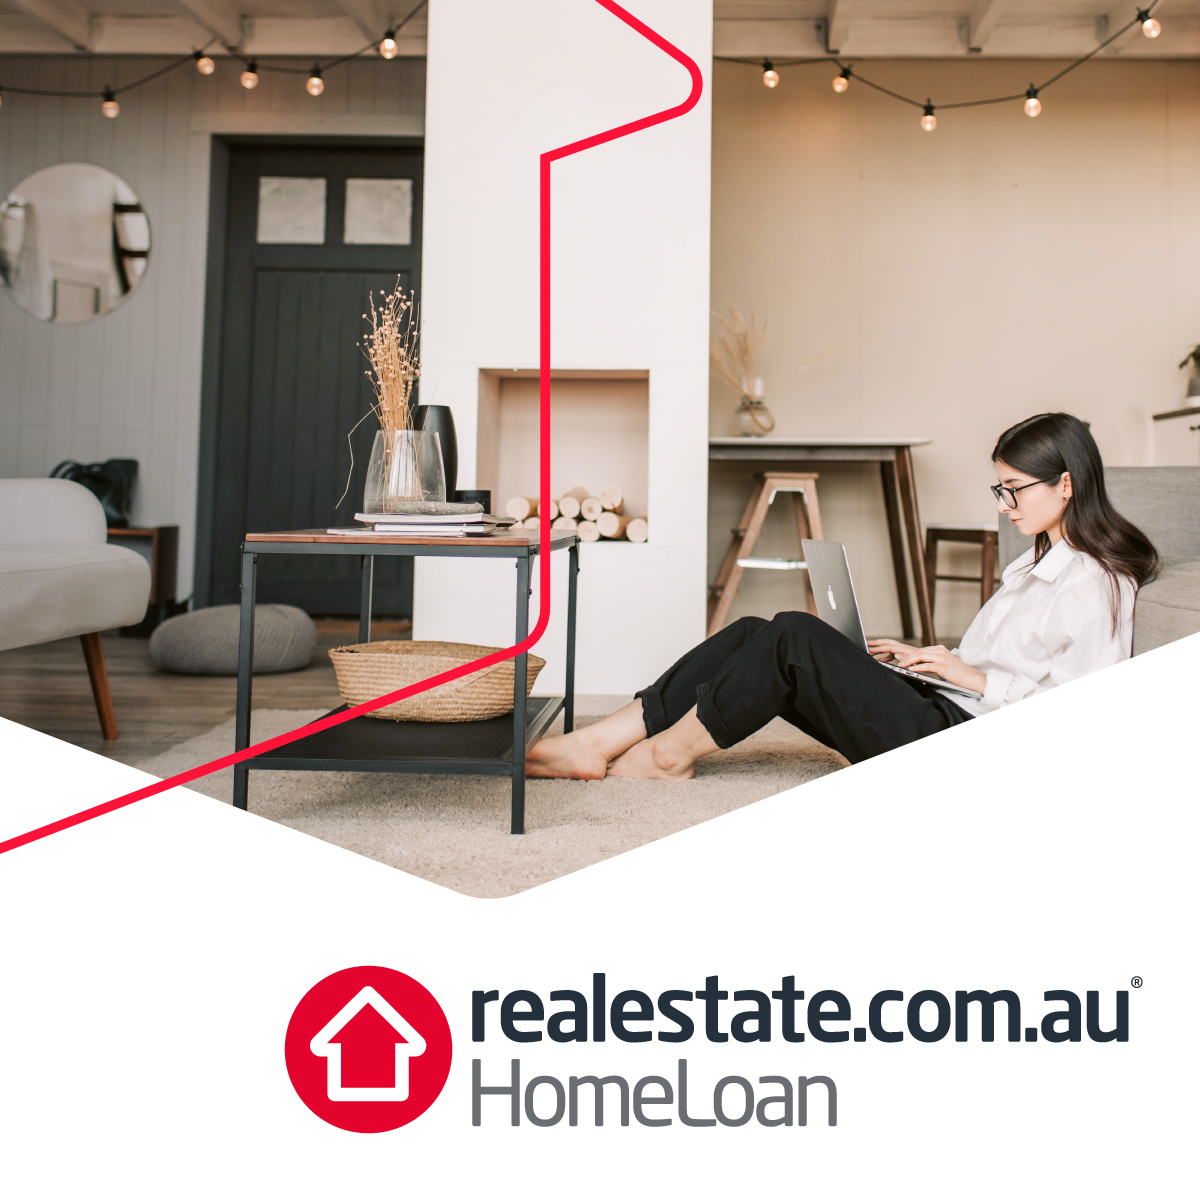 REA Group Realestate.com.au Homeloan Brand Identity Design